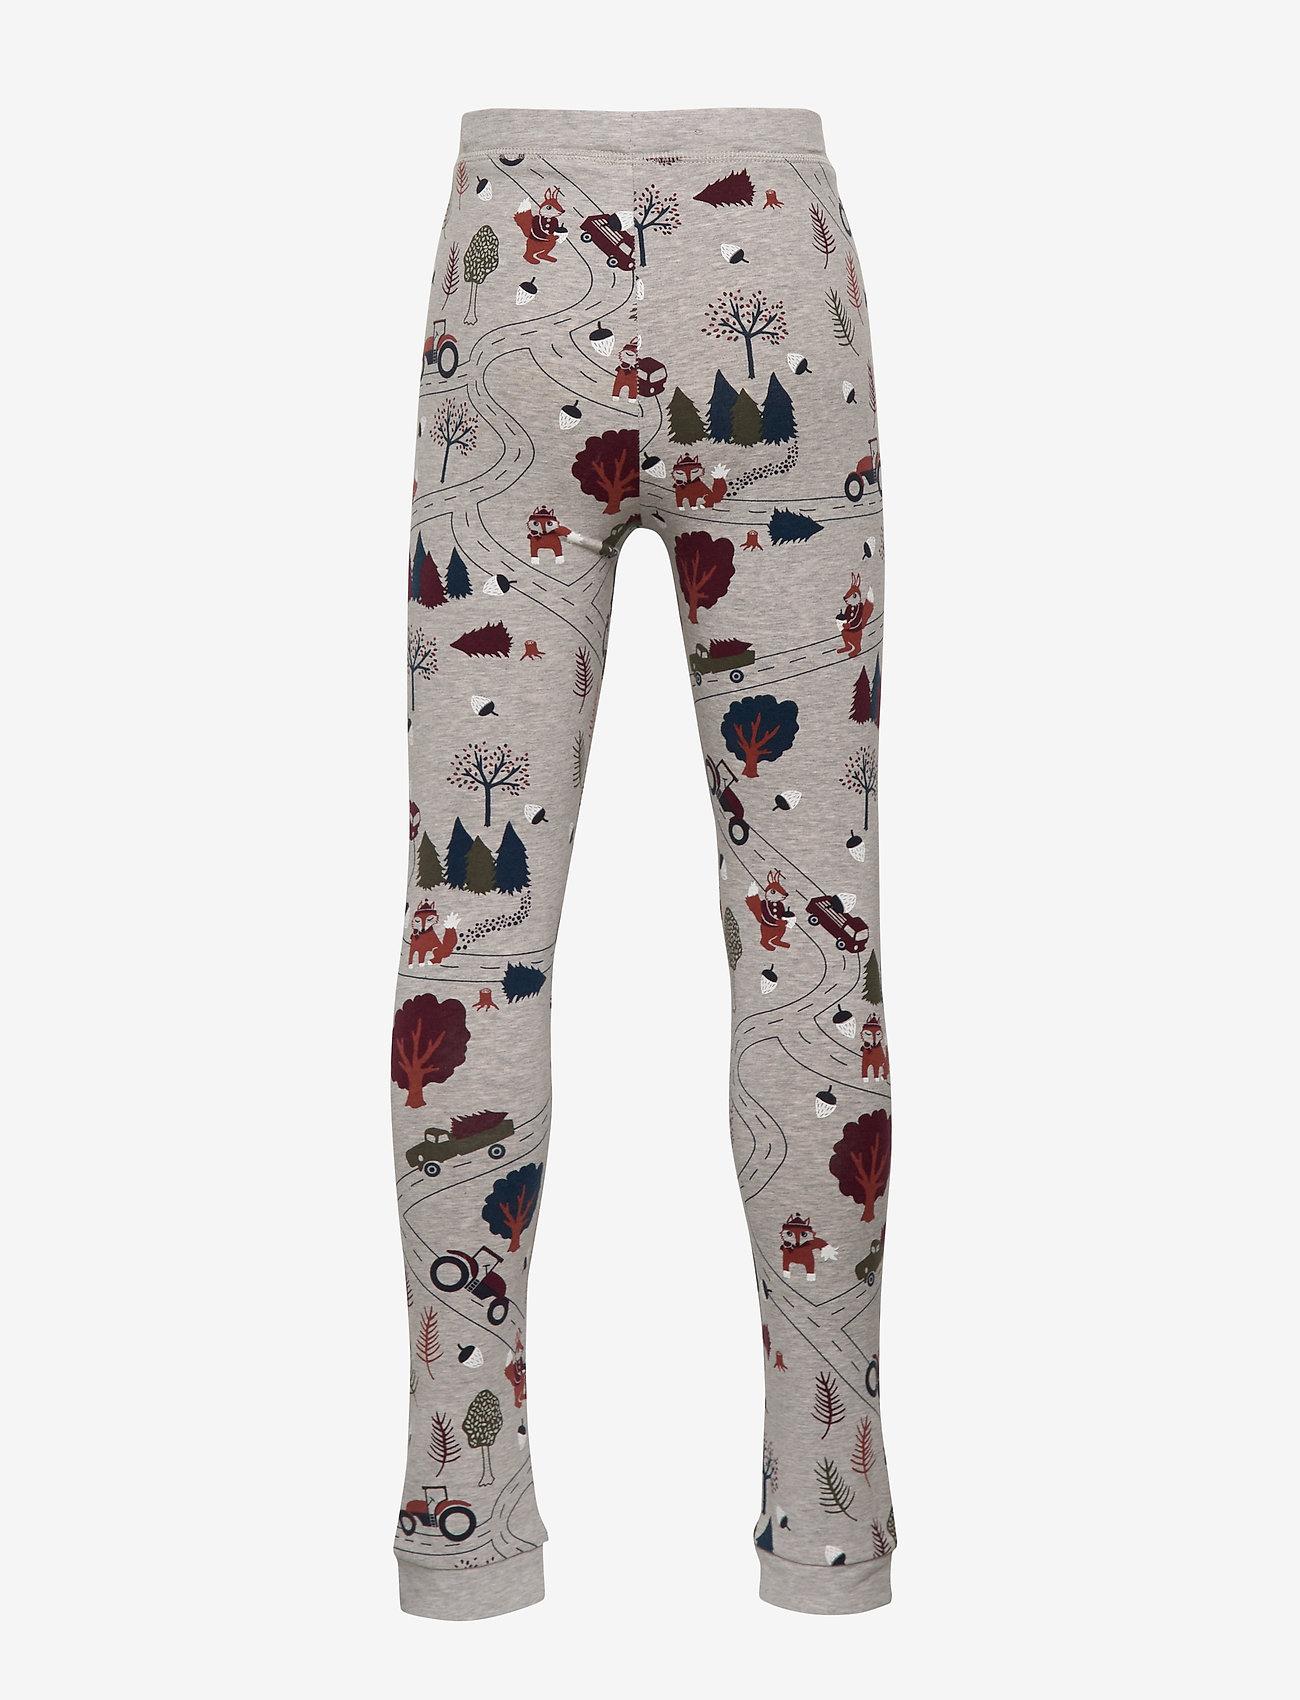 Polarn O. Pyret Trousers Jersey Aop Preschool - Nederdelar Greymelange